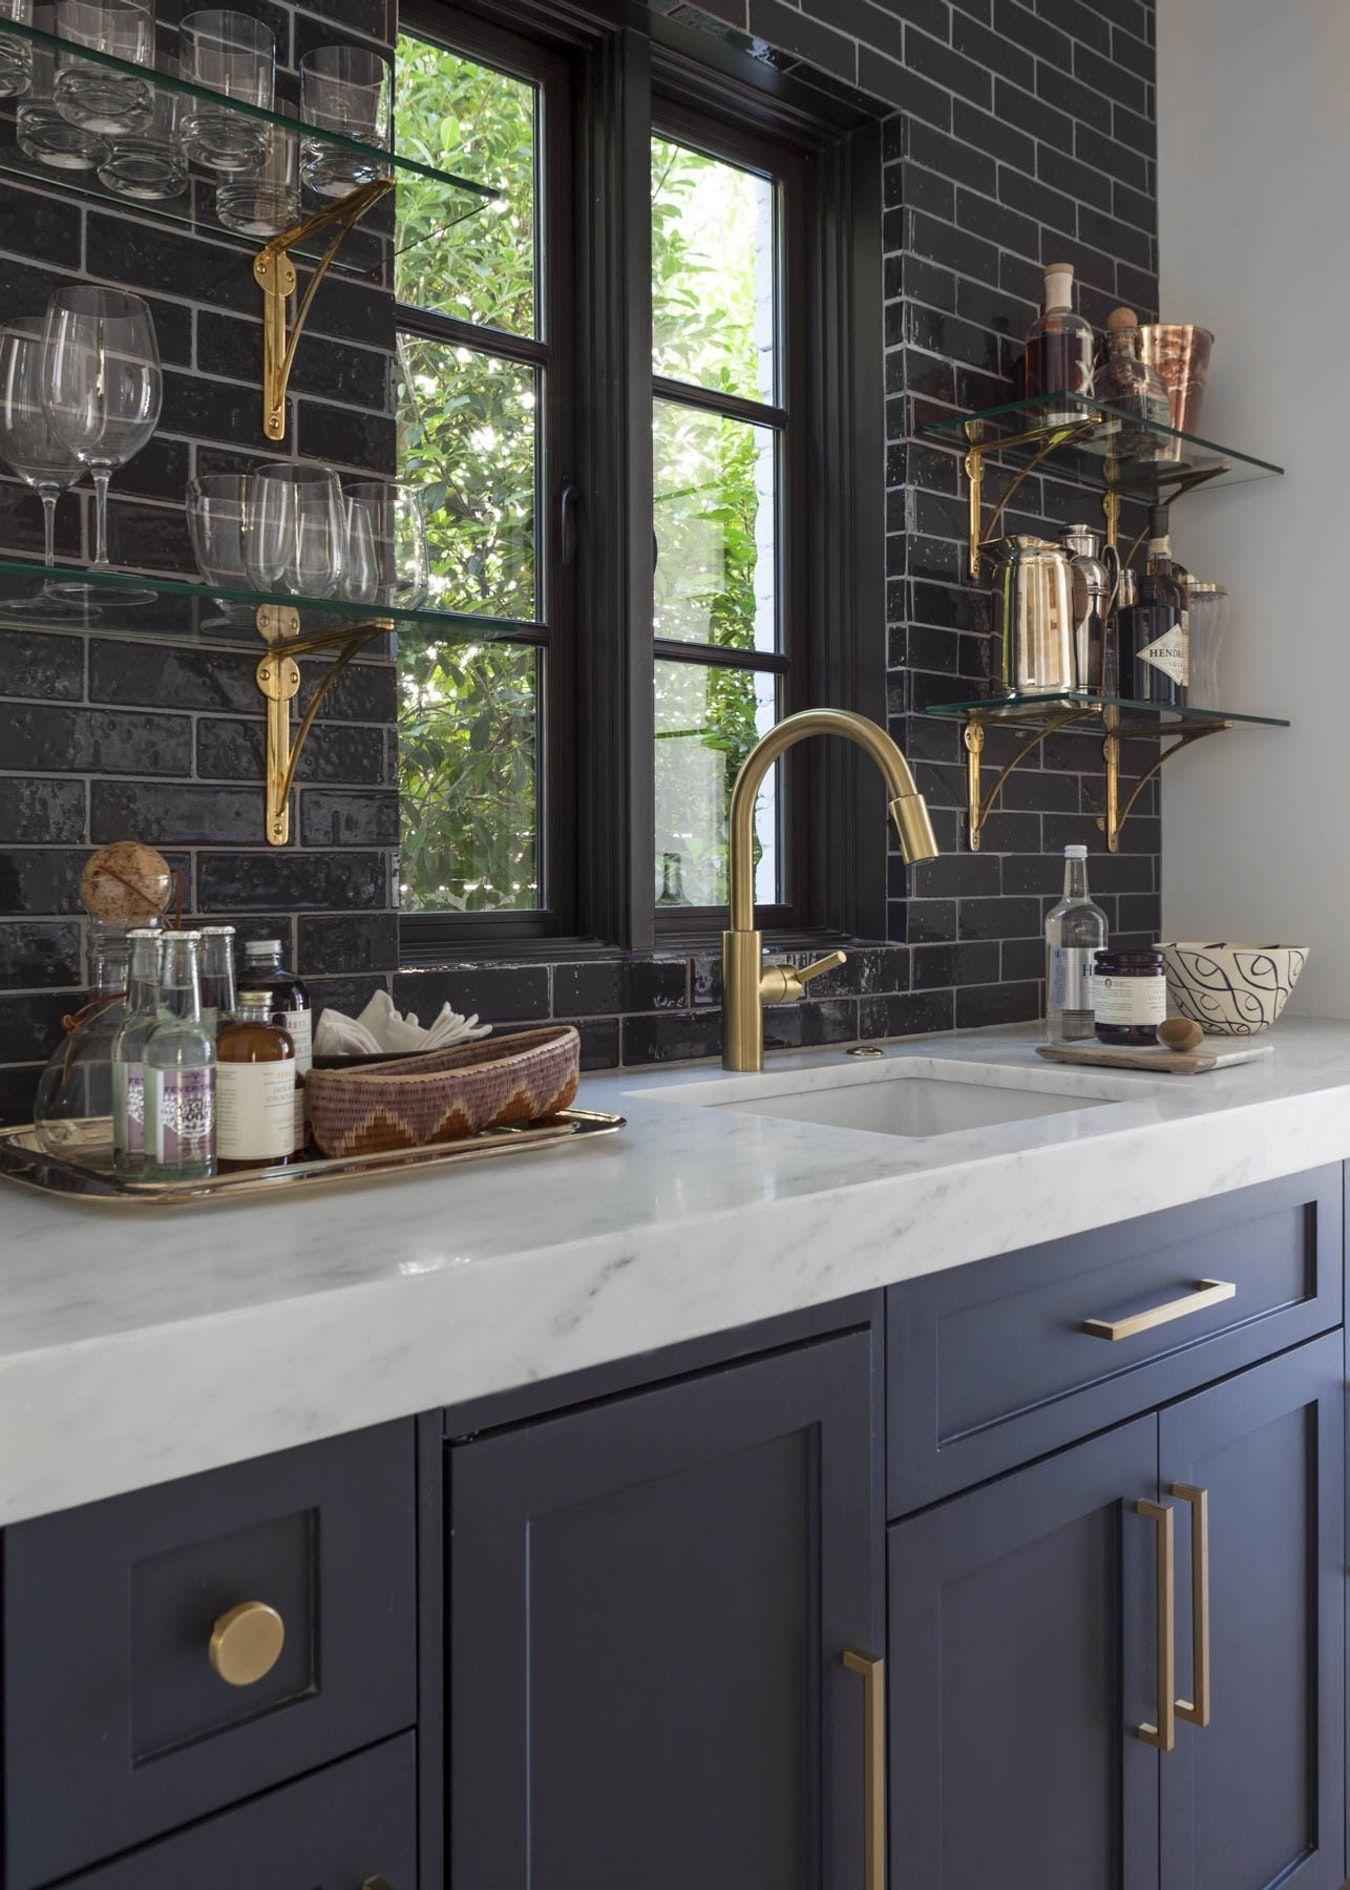 The 10 Best Kitchens On Pinterest With Gold Hardware Living After Midnite Dark Blue Kitchen Cabinets Blue Kitchen Cabinets Dark Blue Kitchens